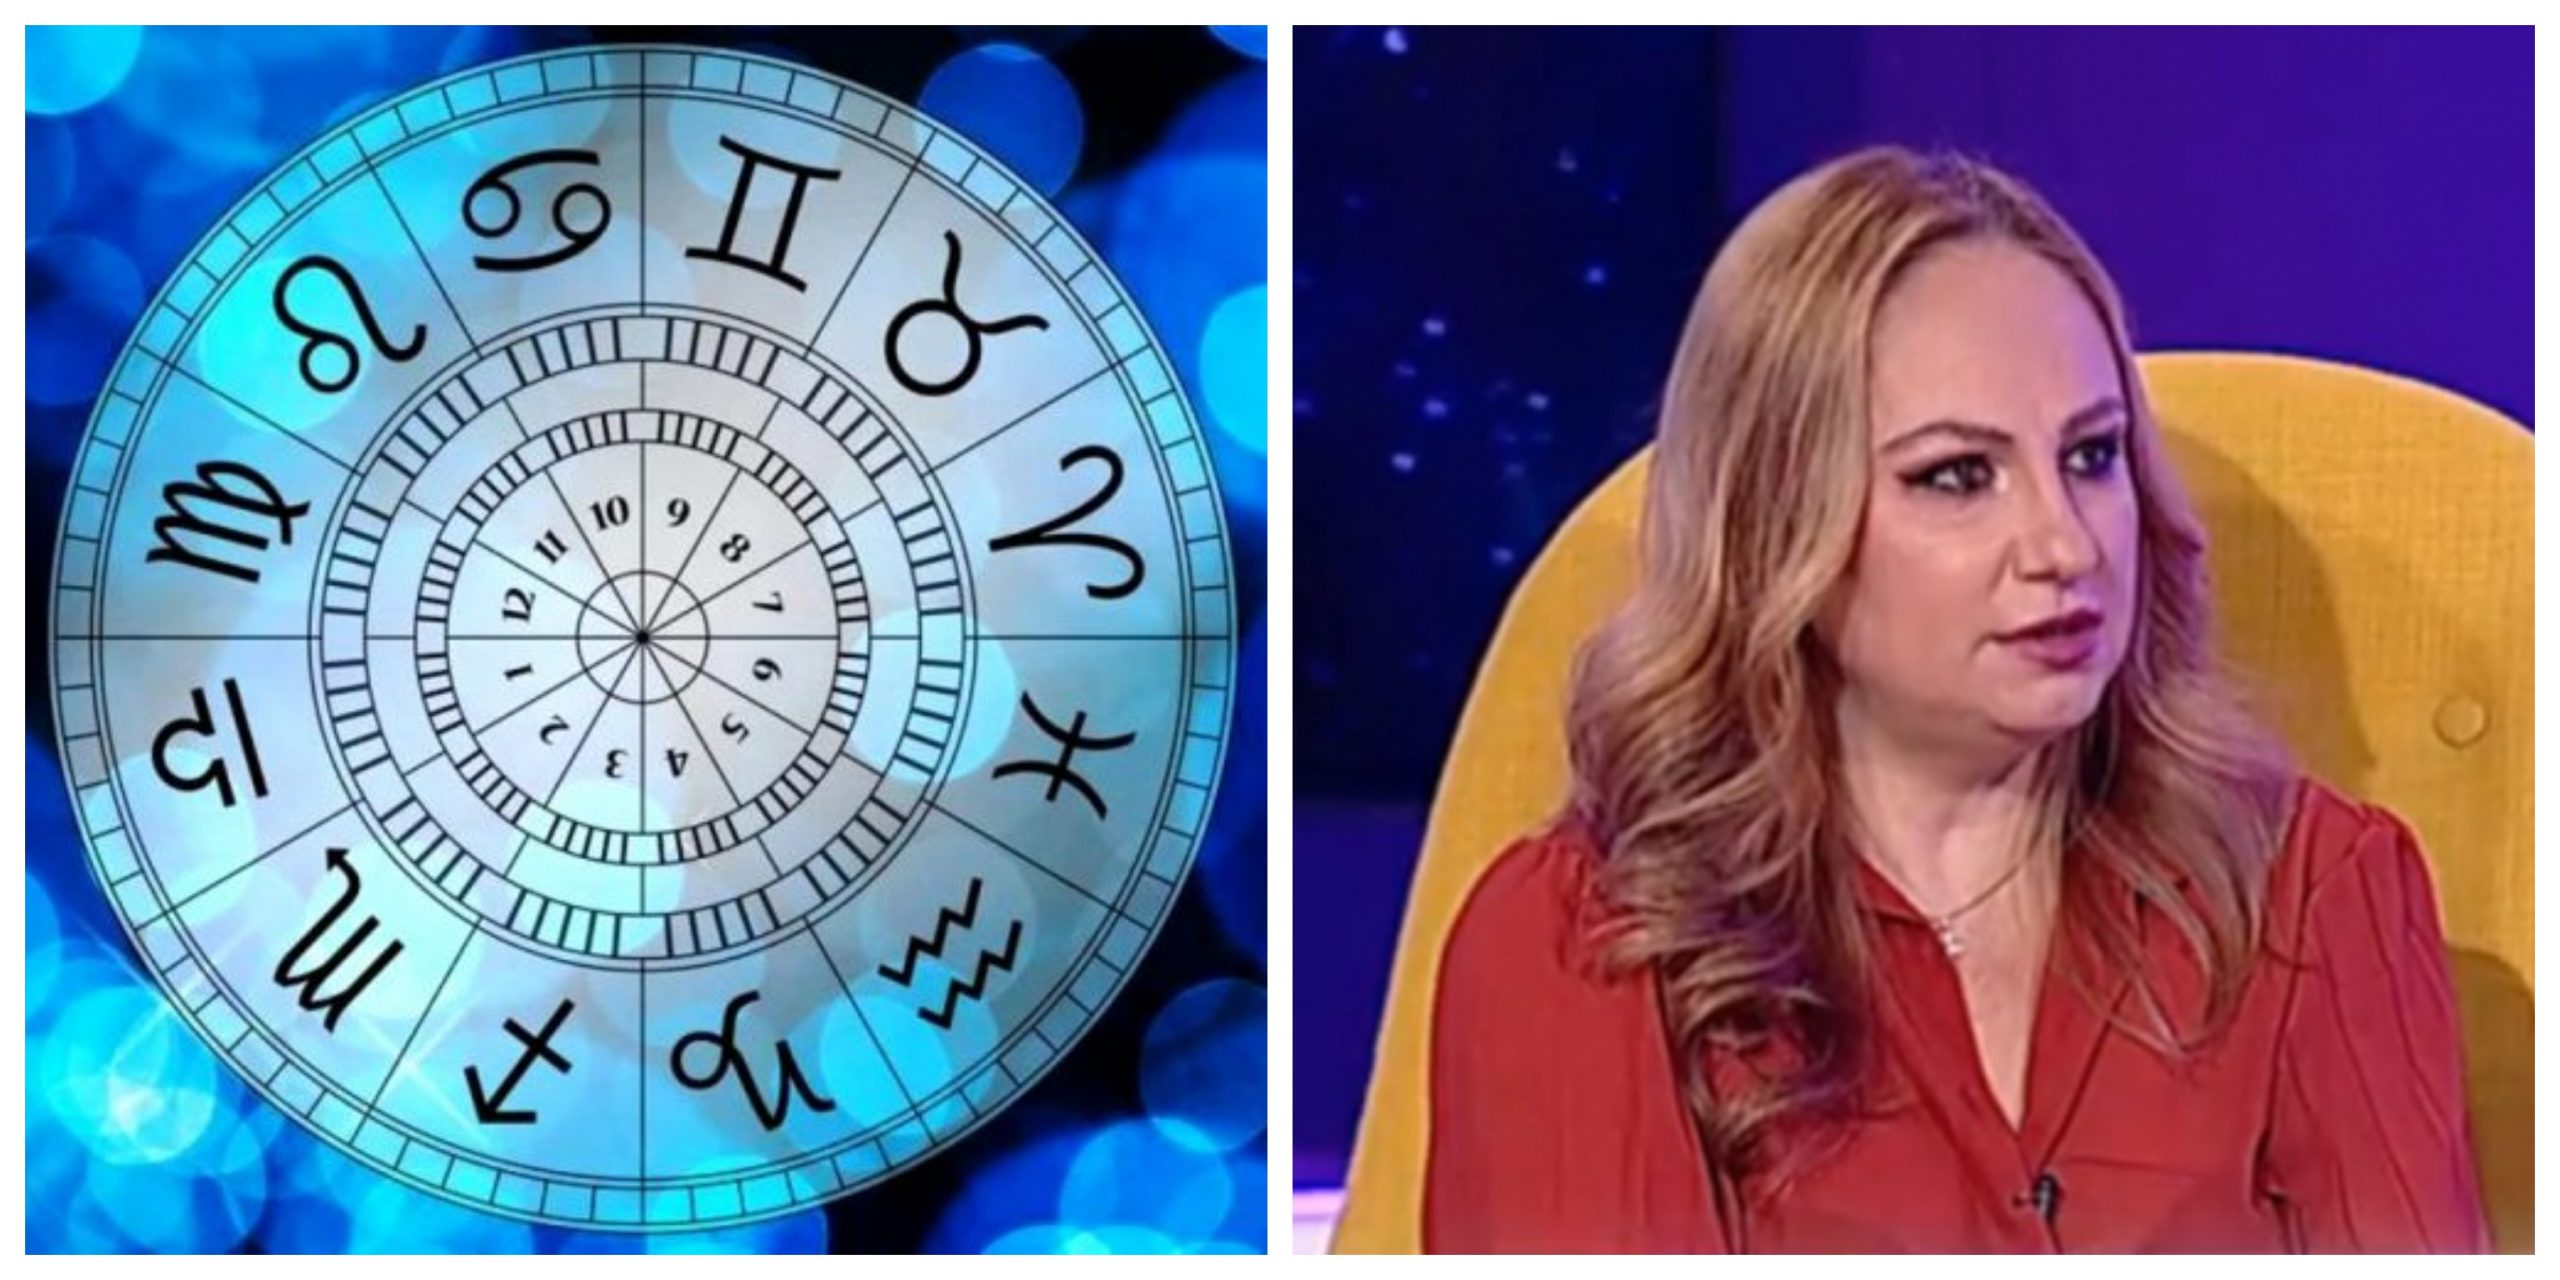 Horoscop Cristina Demetrescu 2021. Pericolele care ne pândesc